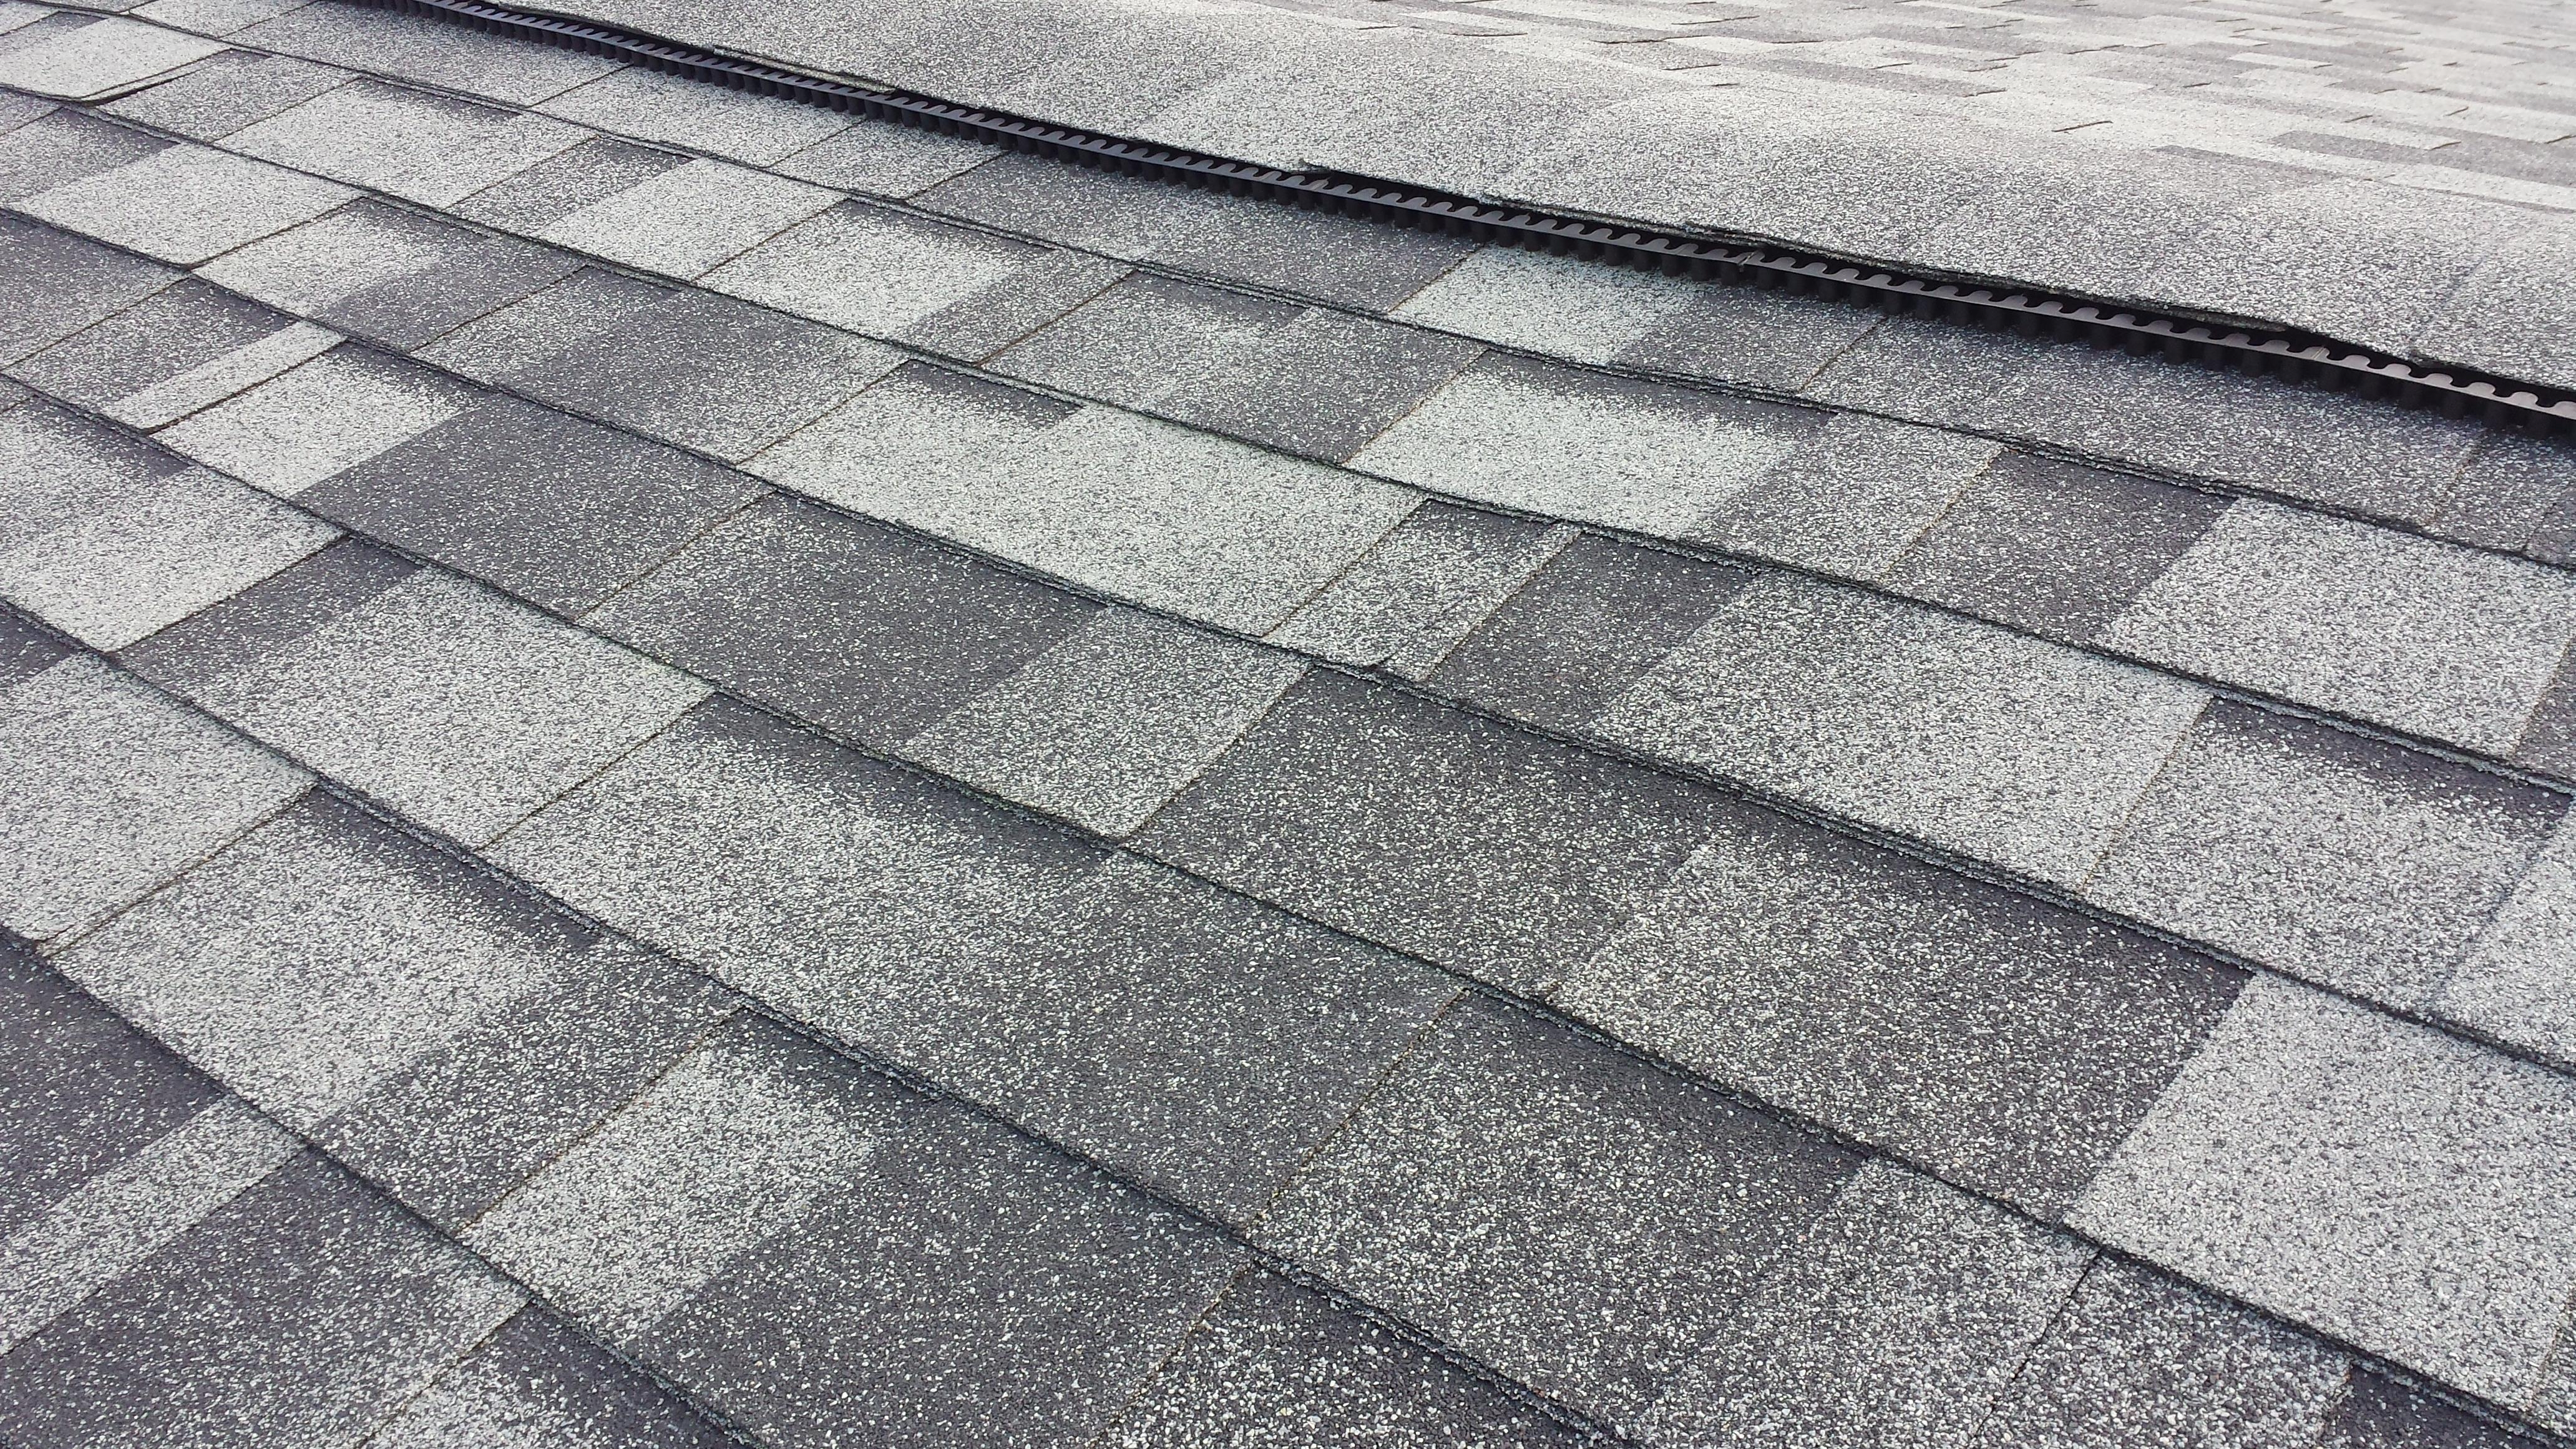 Asphalt Roof Shingles Malaysia Building Material